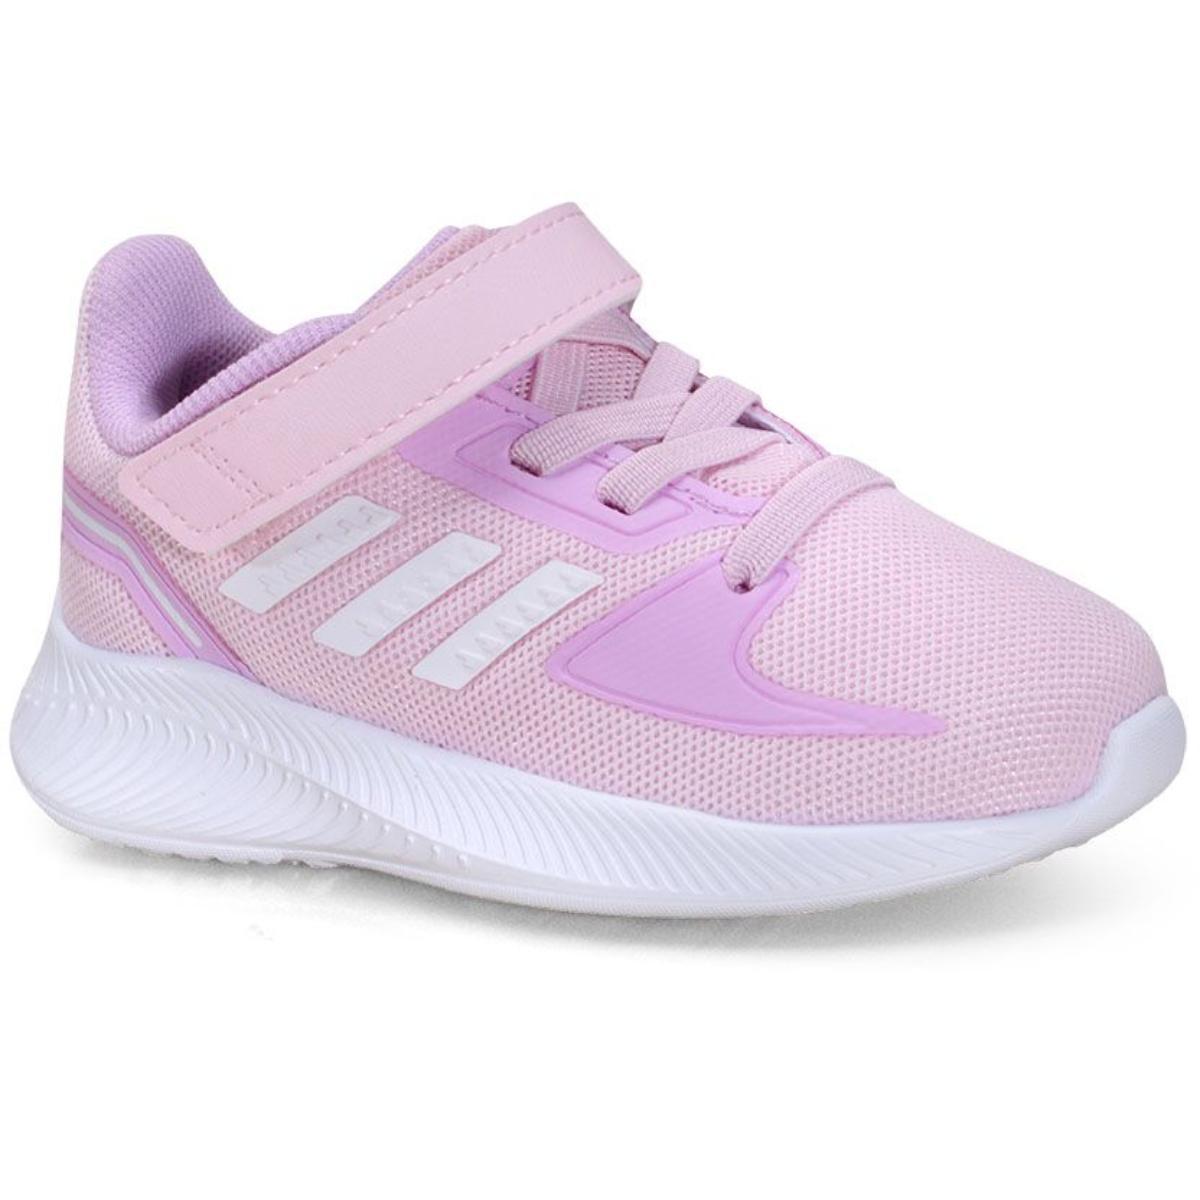 Tênis Fem Infantil Adidas Fz0097 Runfalcon 2.0 Lilas